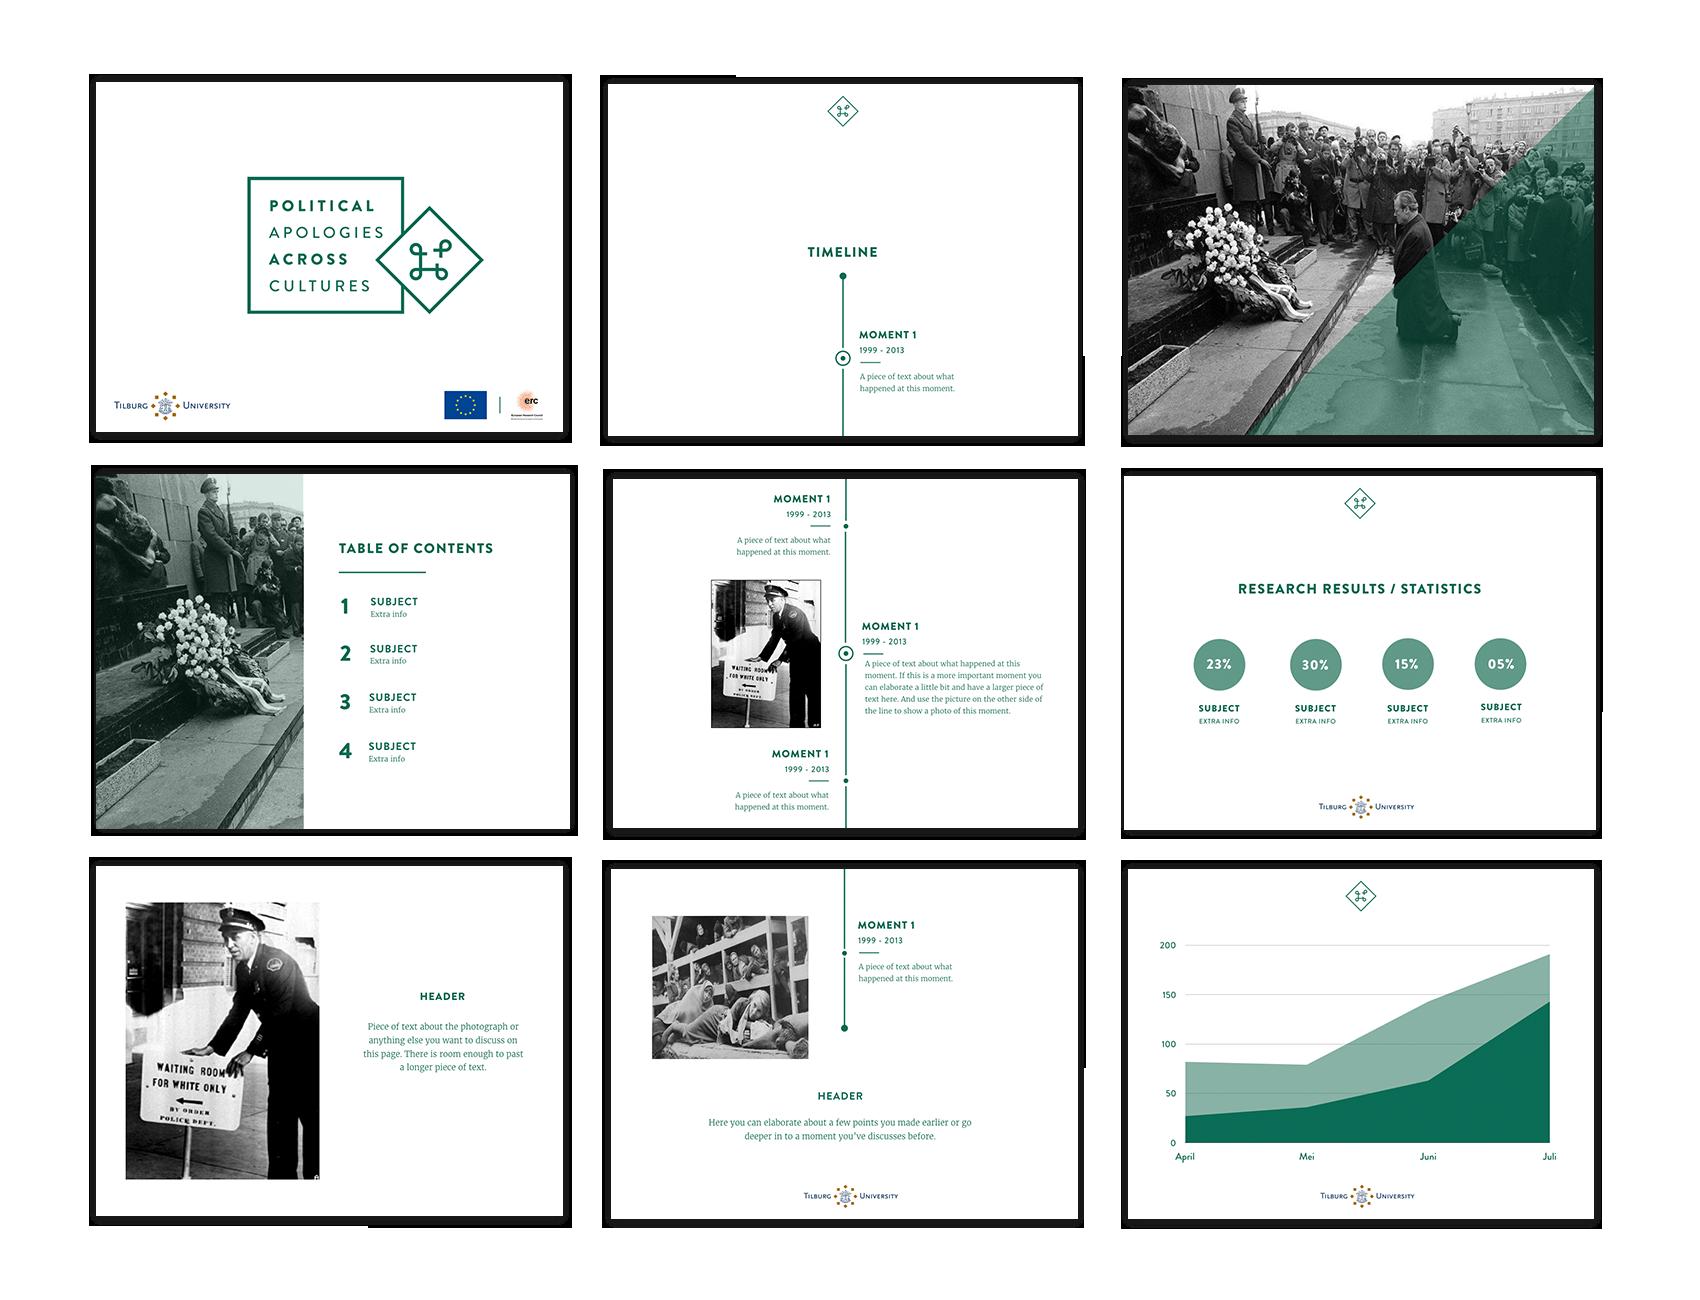 Political Apologies Across Cultures Presentation Design